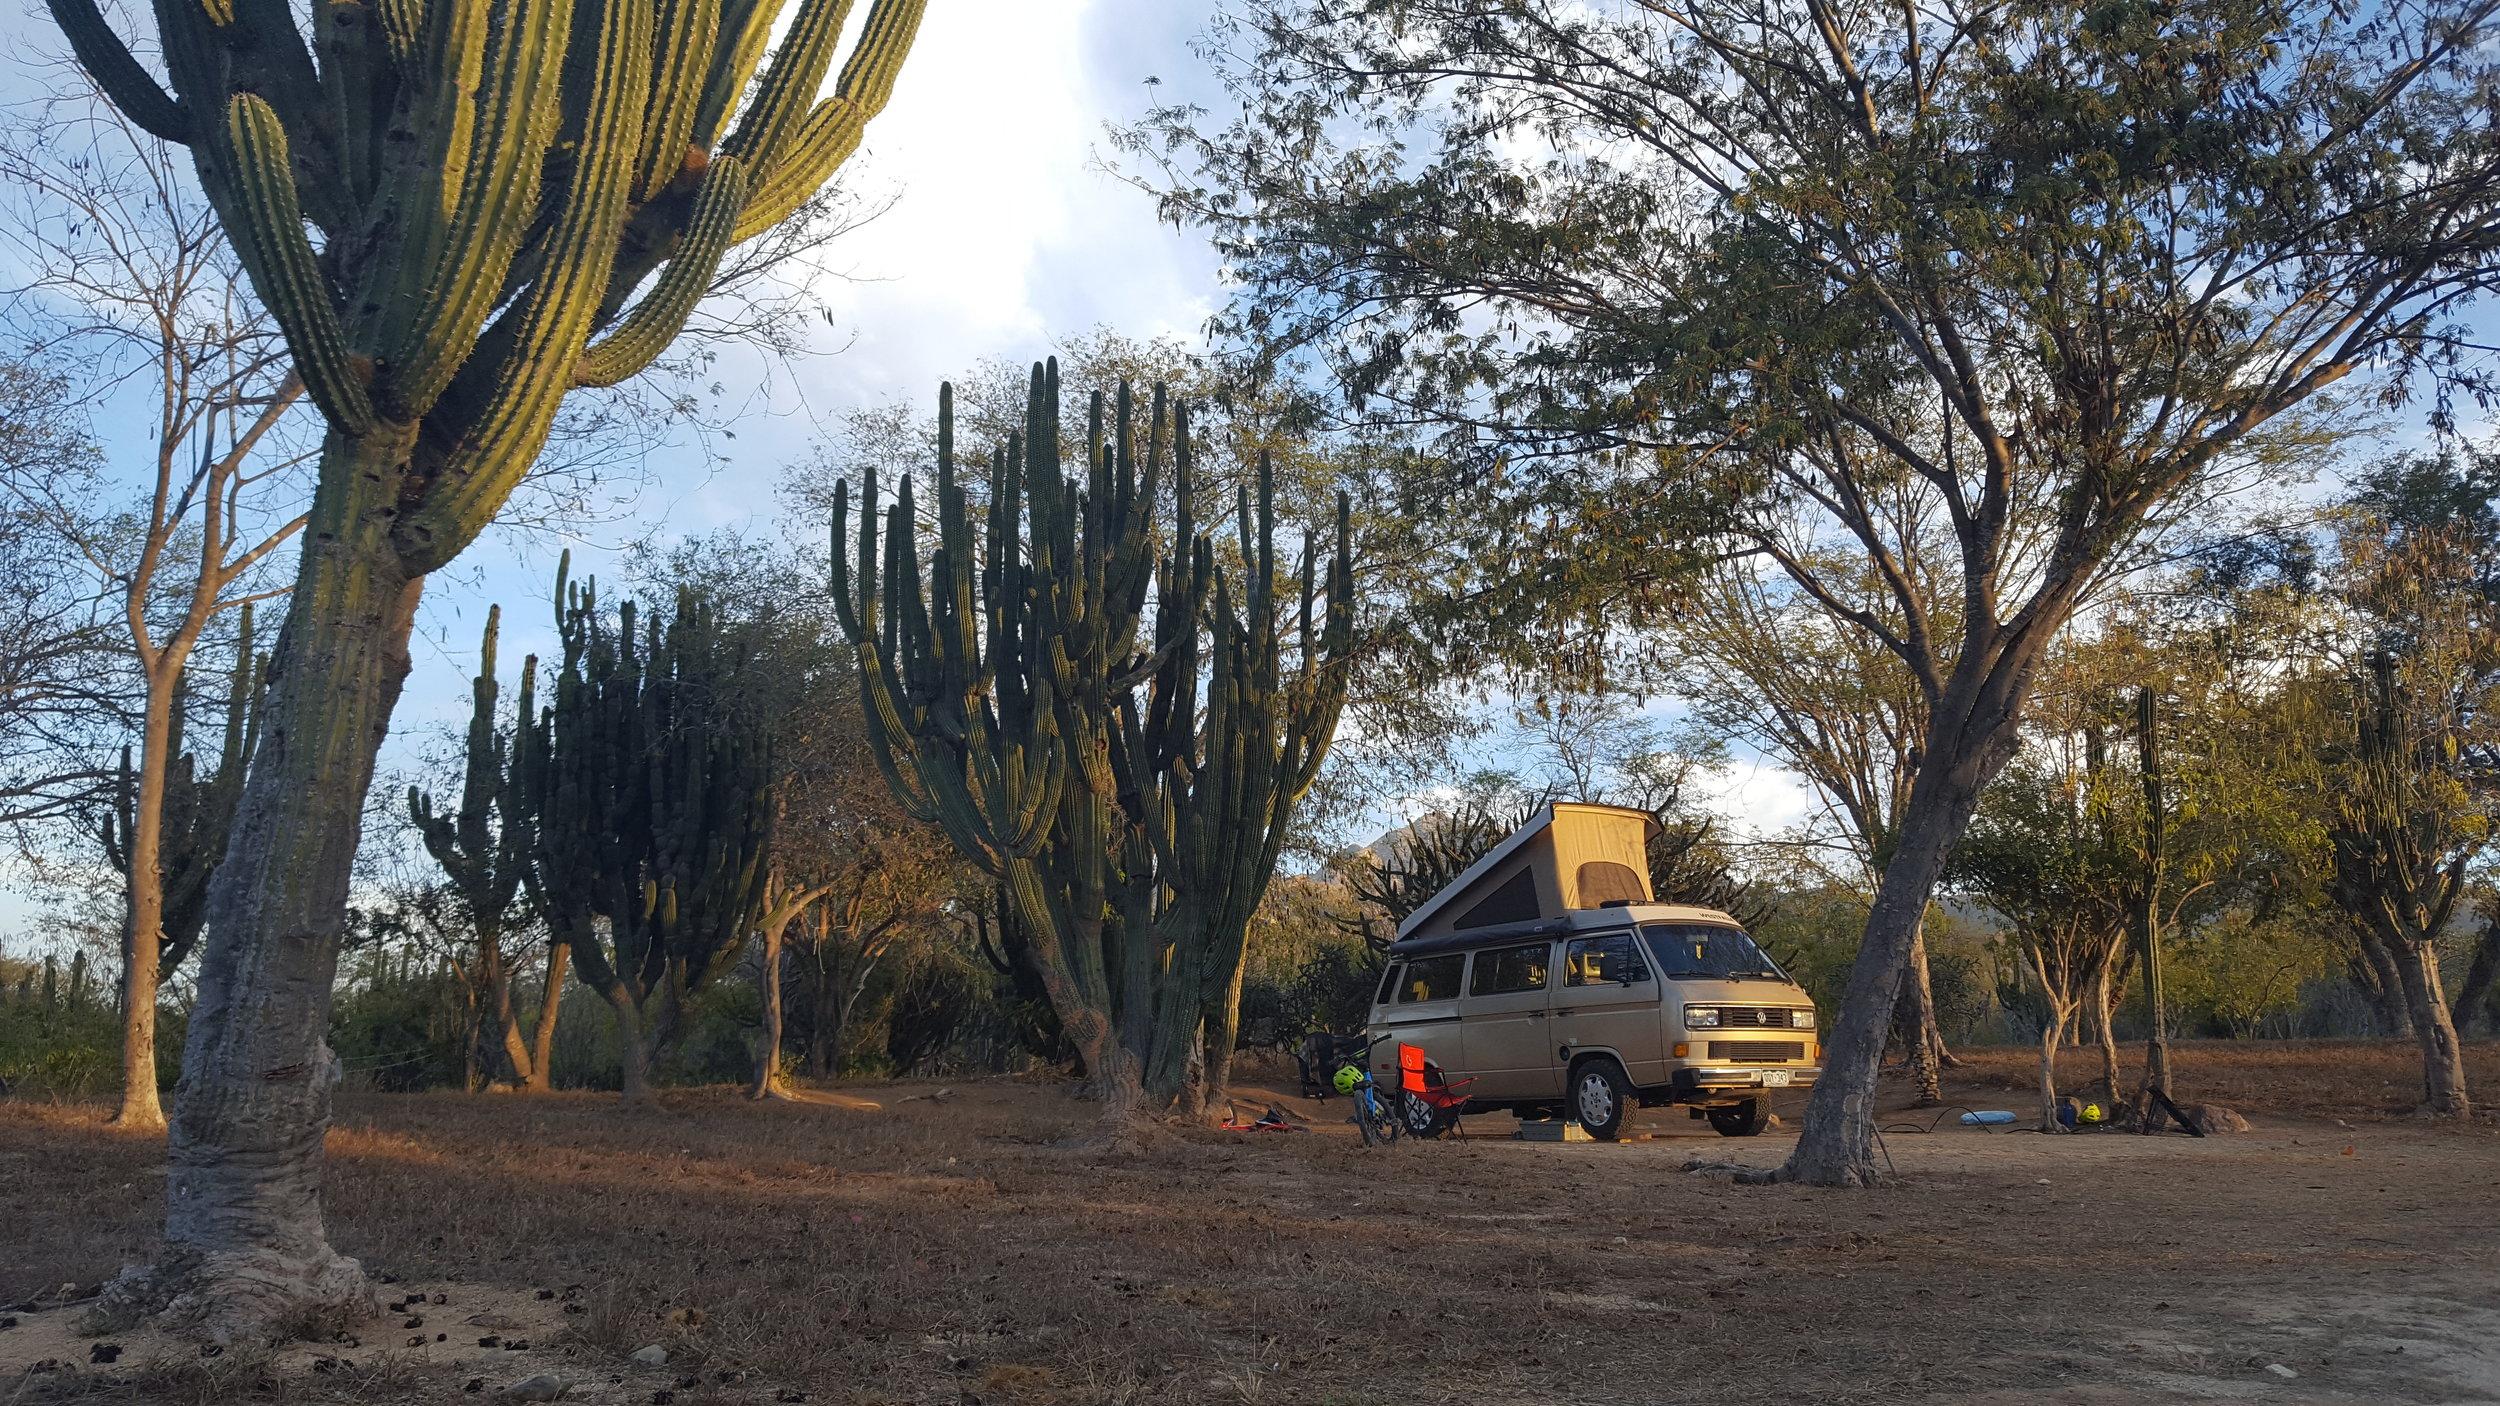 Cactus camping outside Los Barriles, Baja Mexico